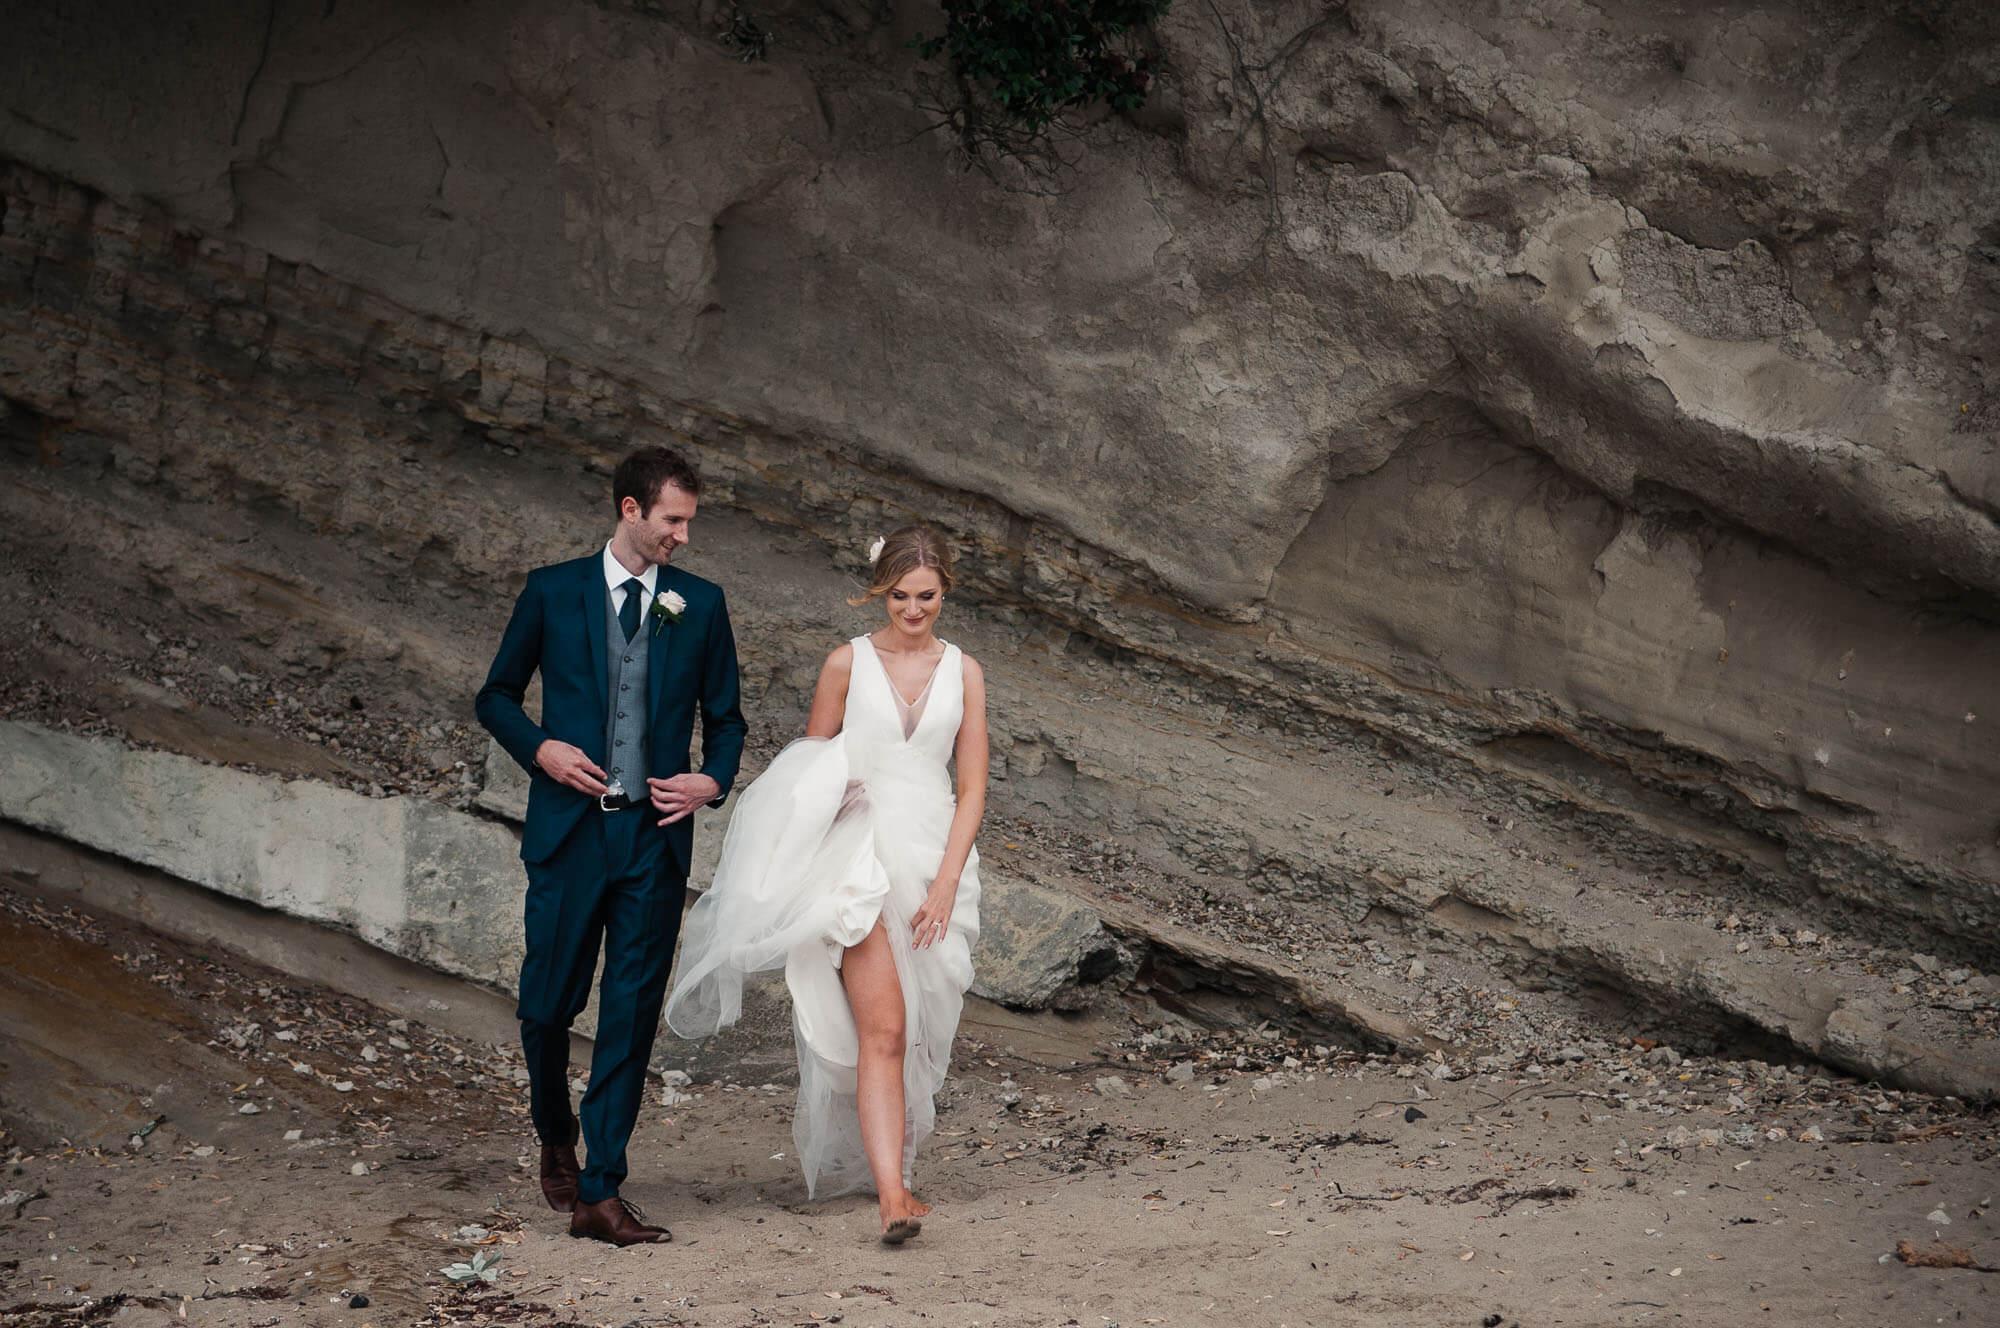 bride-and-groom-walk-barefoot-down-beach.jpg